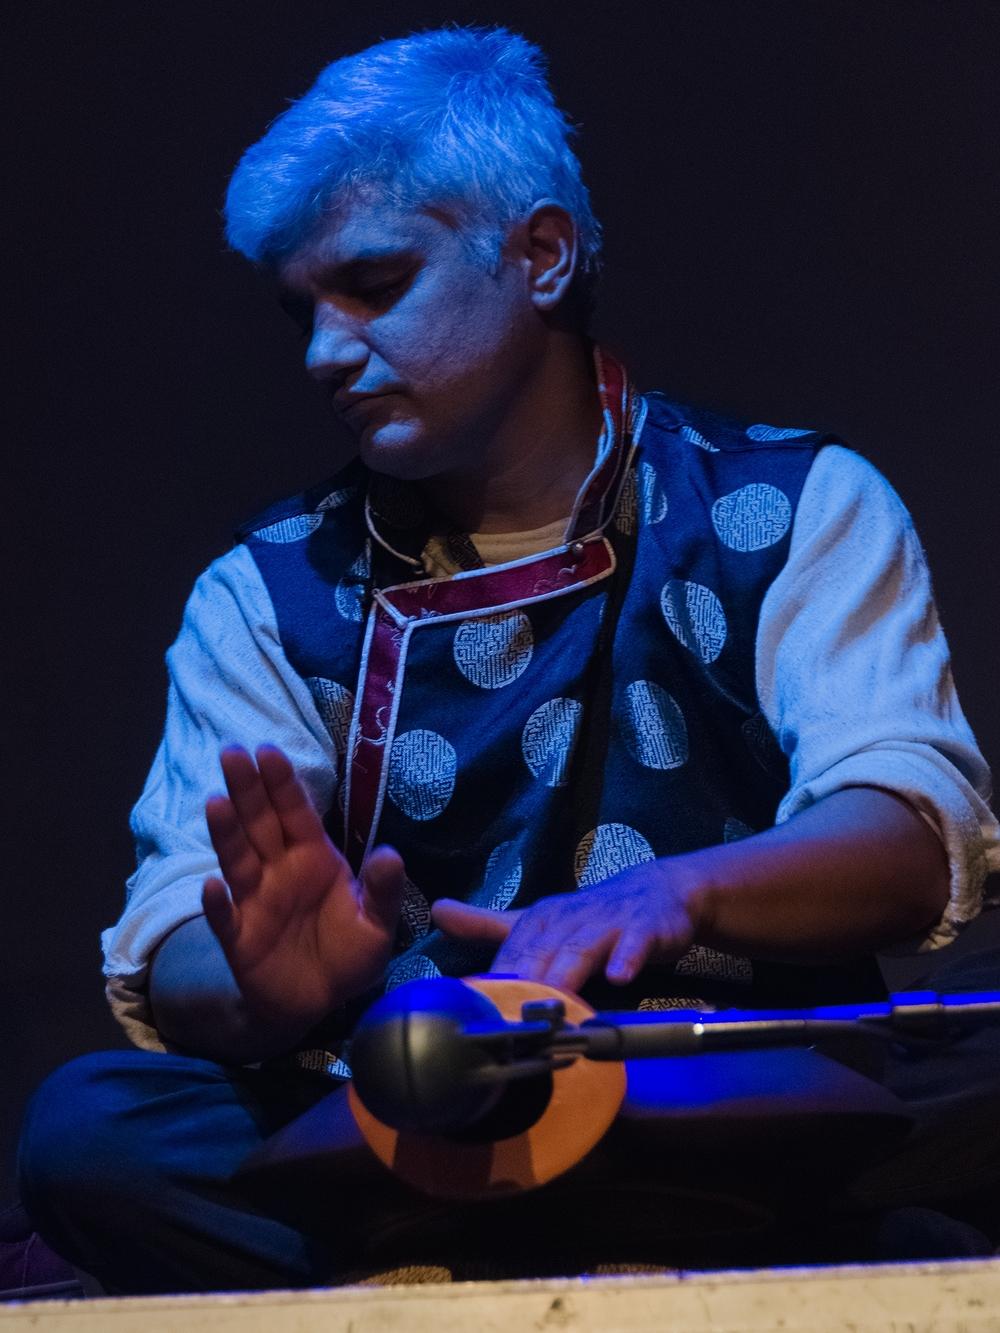 Michel Tyabji